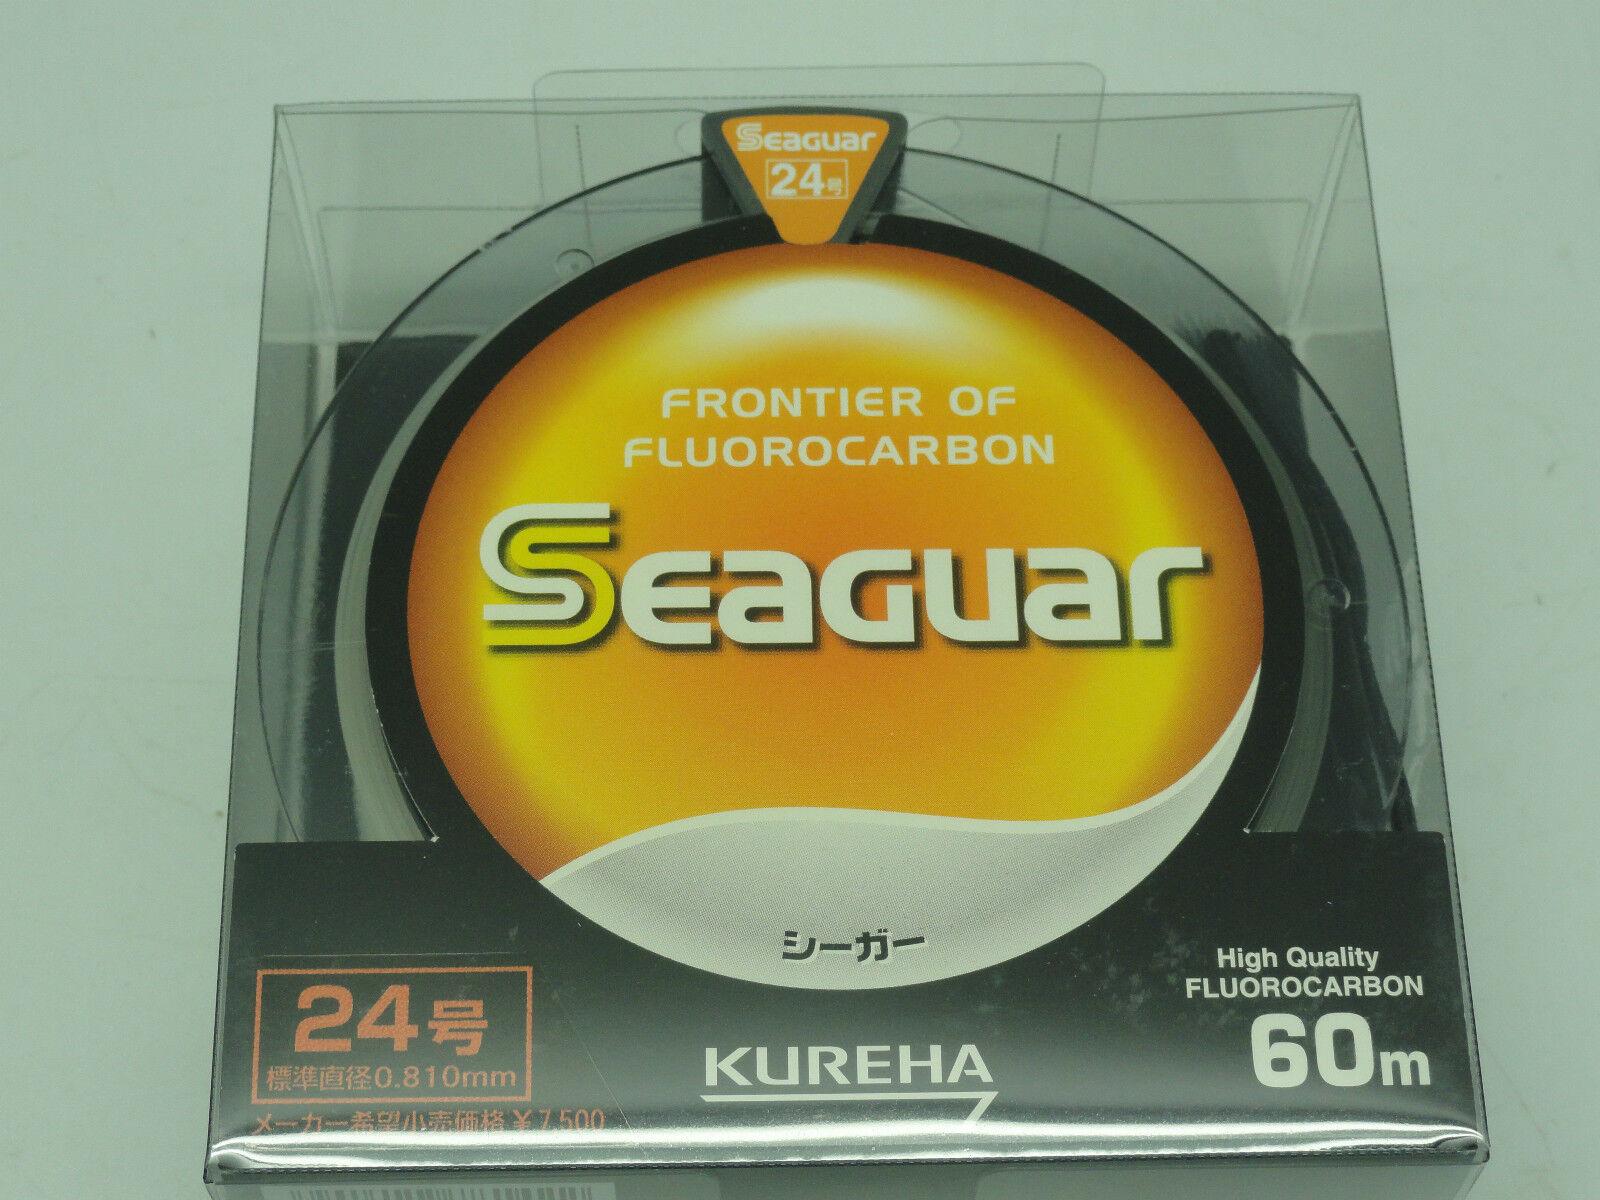 SEAGUAR davantiIER gree gioco FLUoroautoBON LEADER Japan   24 U.S 90 lb 60m66yds